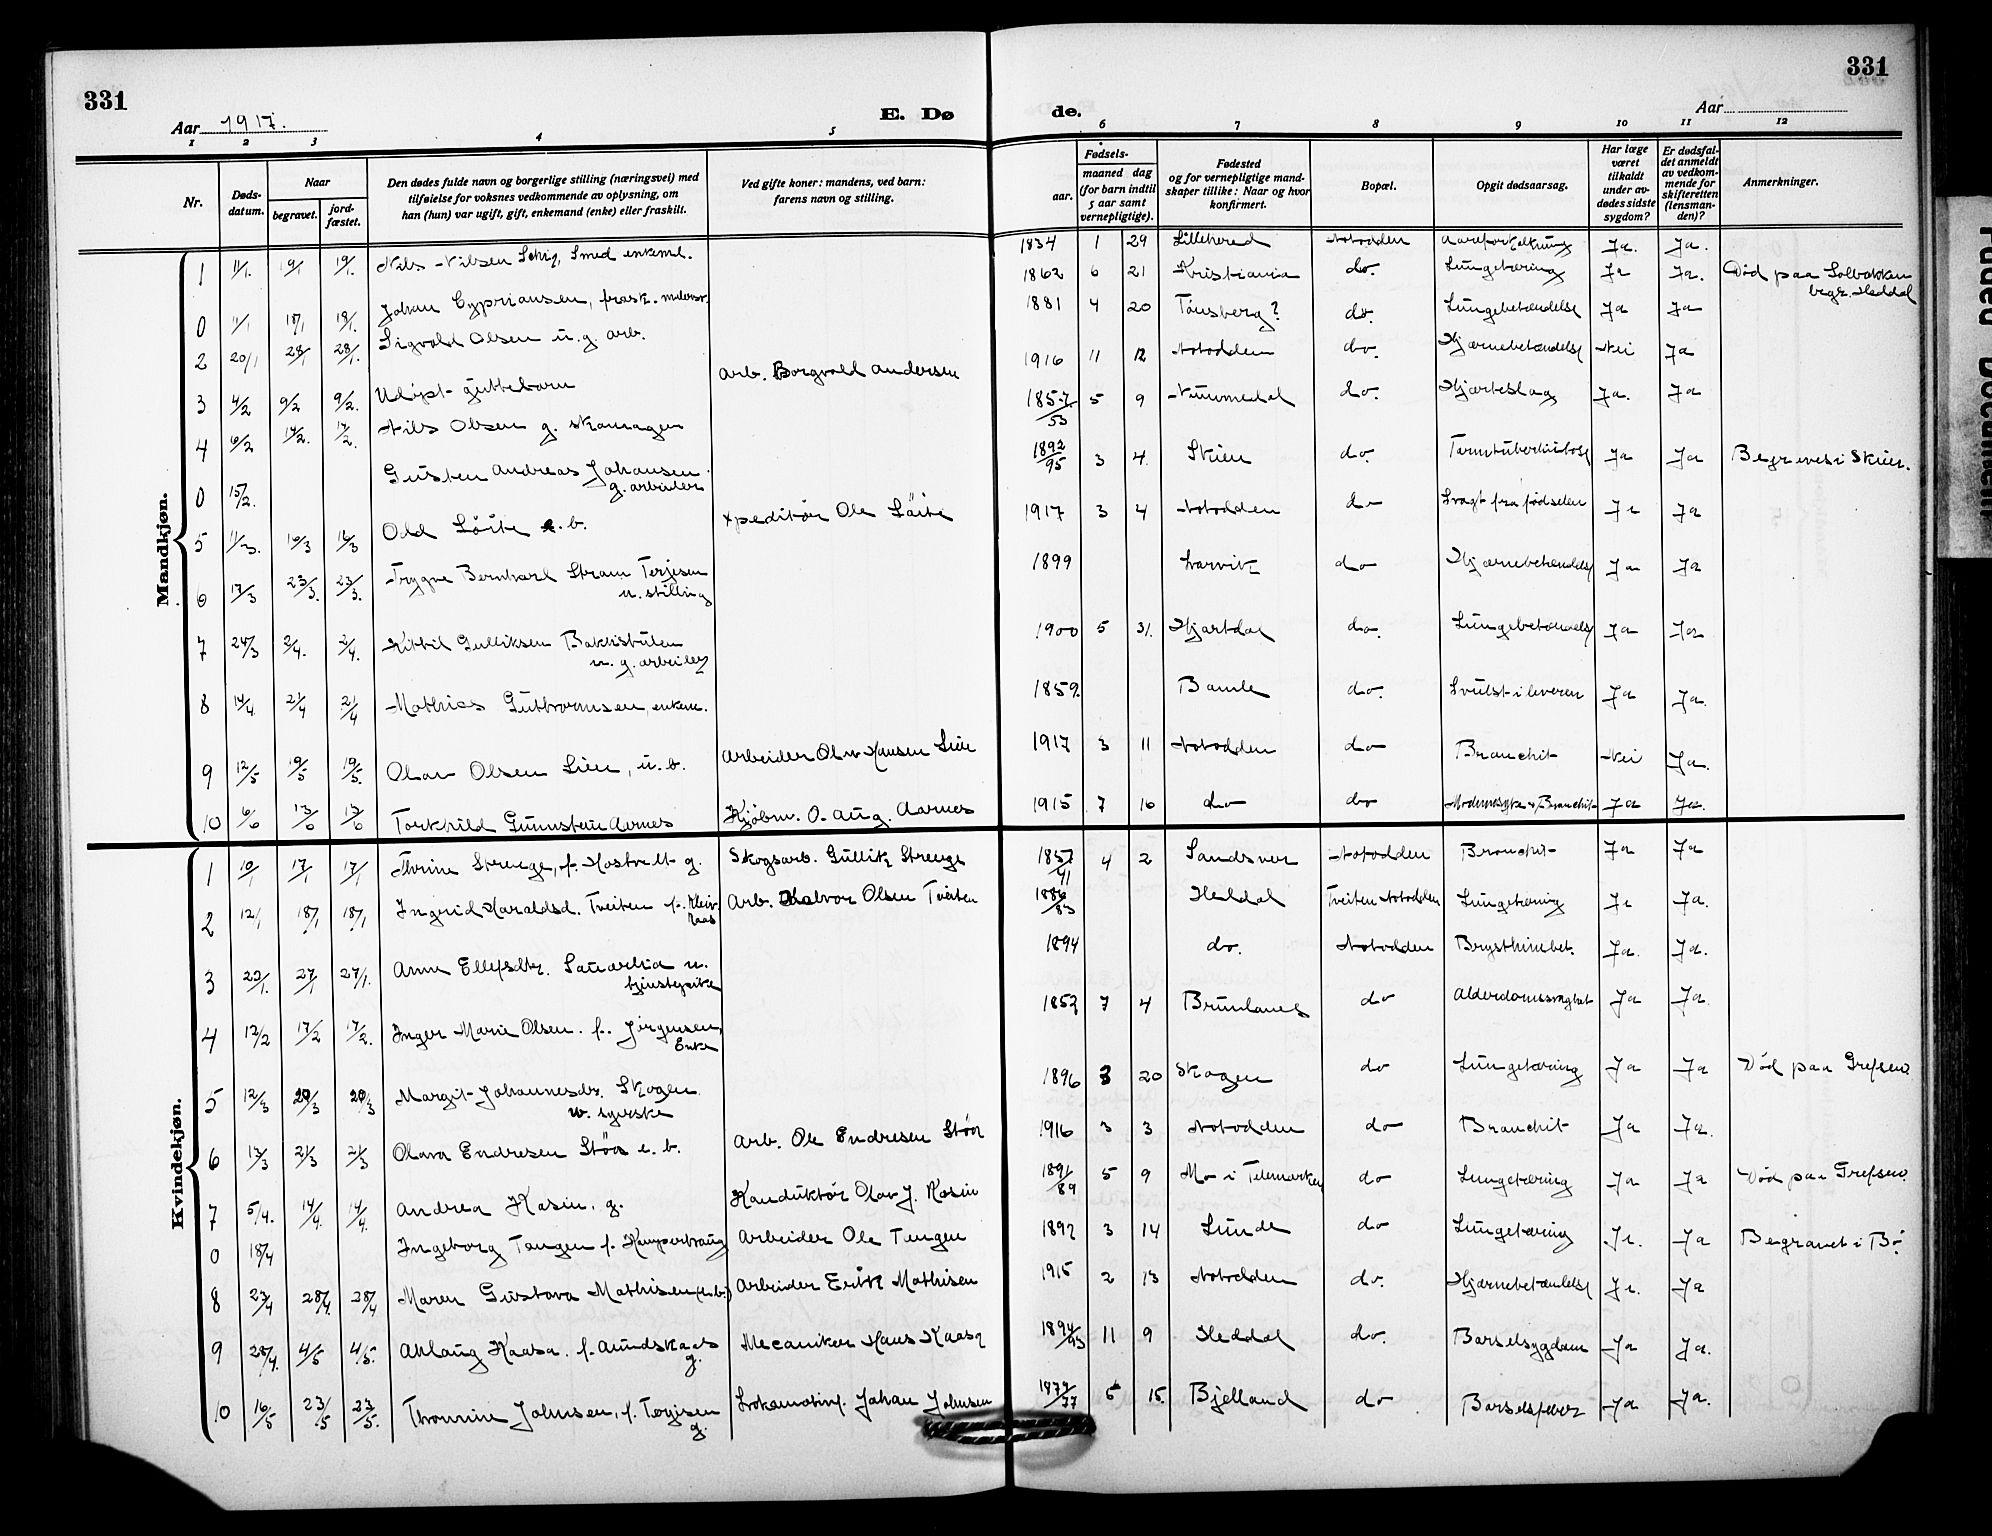 SAKO, Notodden kirkebøker, G/Ga/L0001: Klokkerbok nr. 1, 1912-1923, s. 331